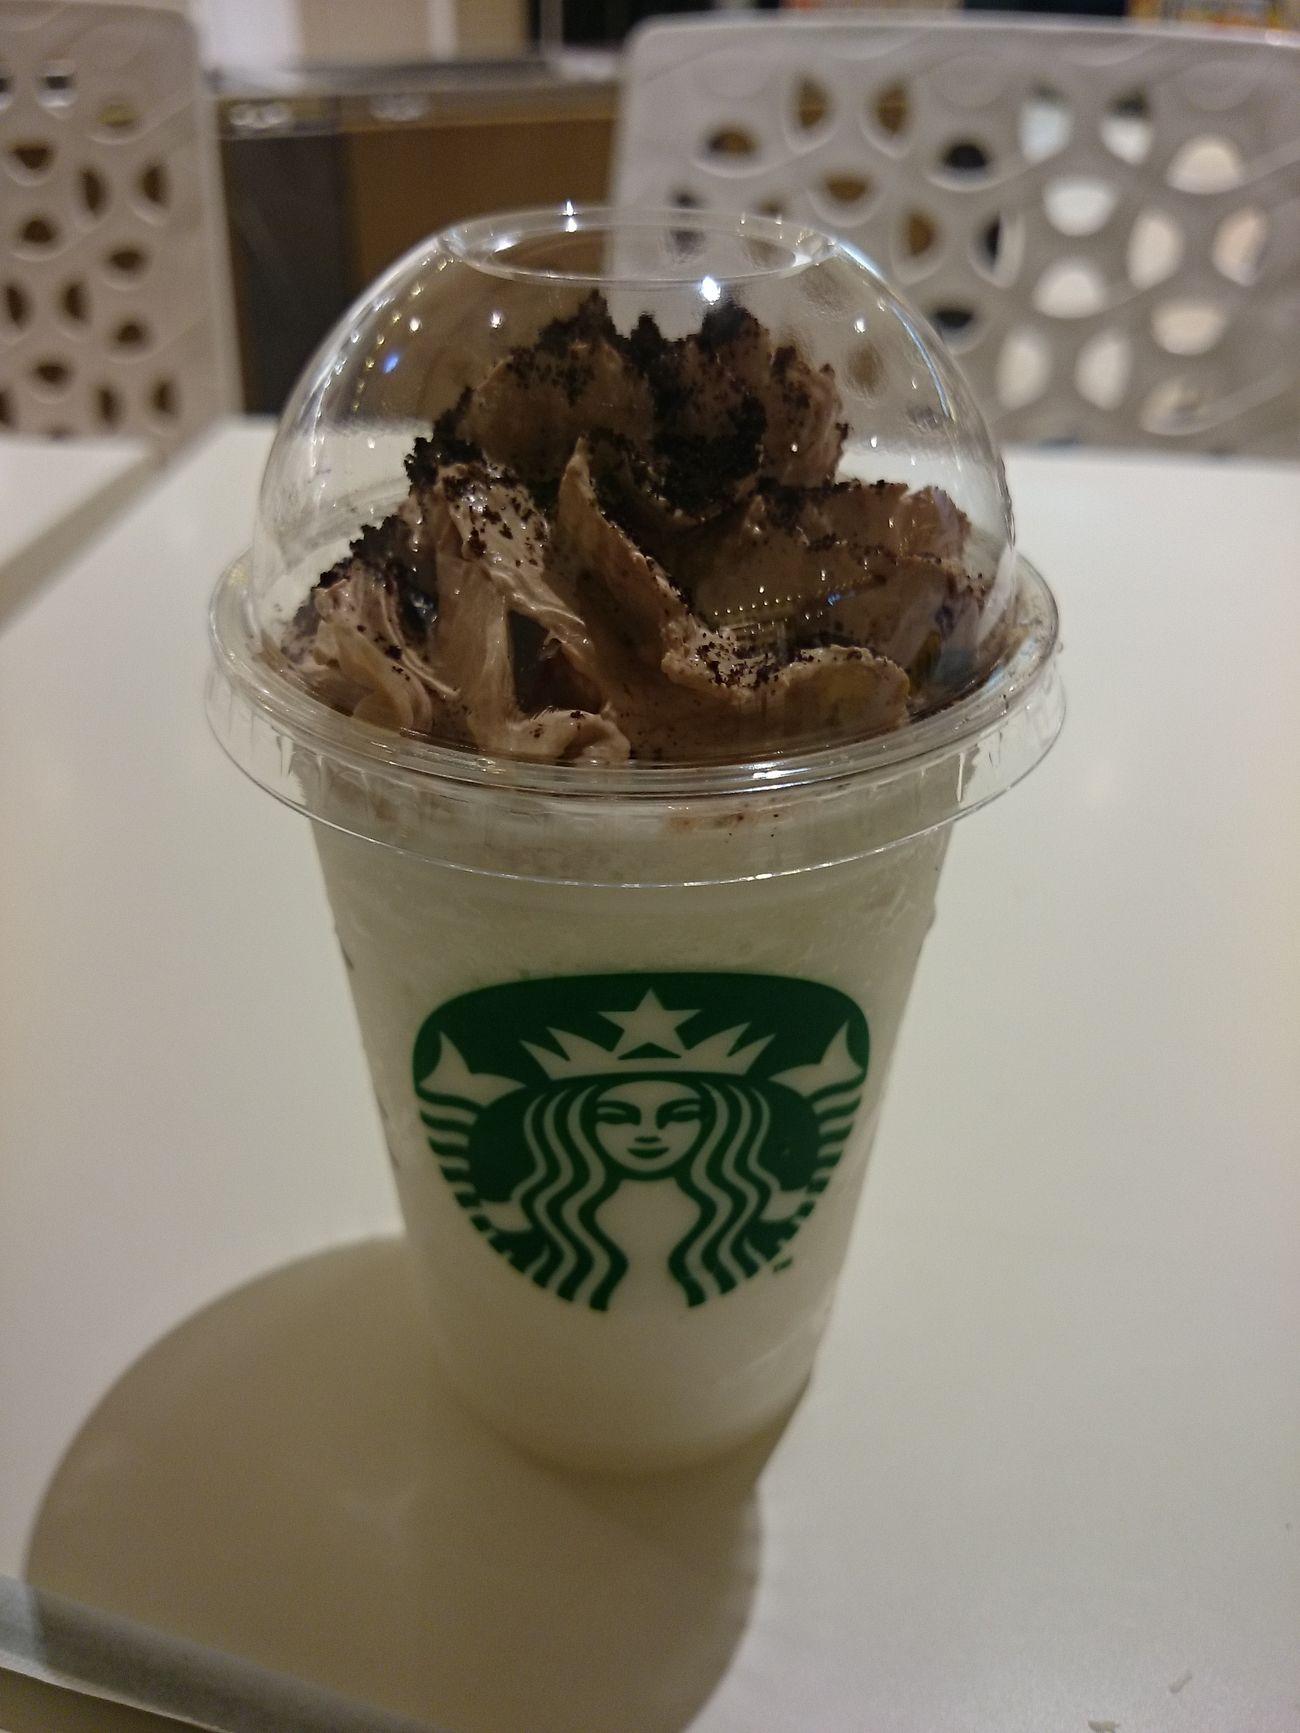 Hokkaido,Japan Starbucks Drinking Starbucks 新千歳空港店限定のフラペチーノ(・ω・)。